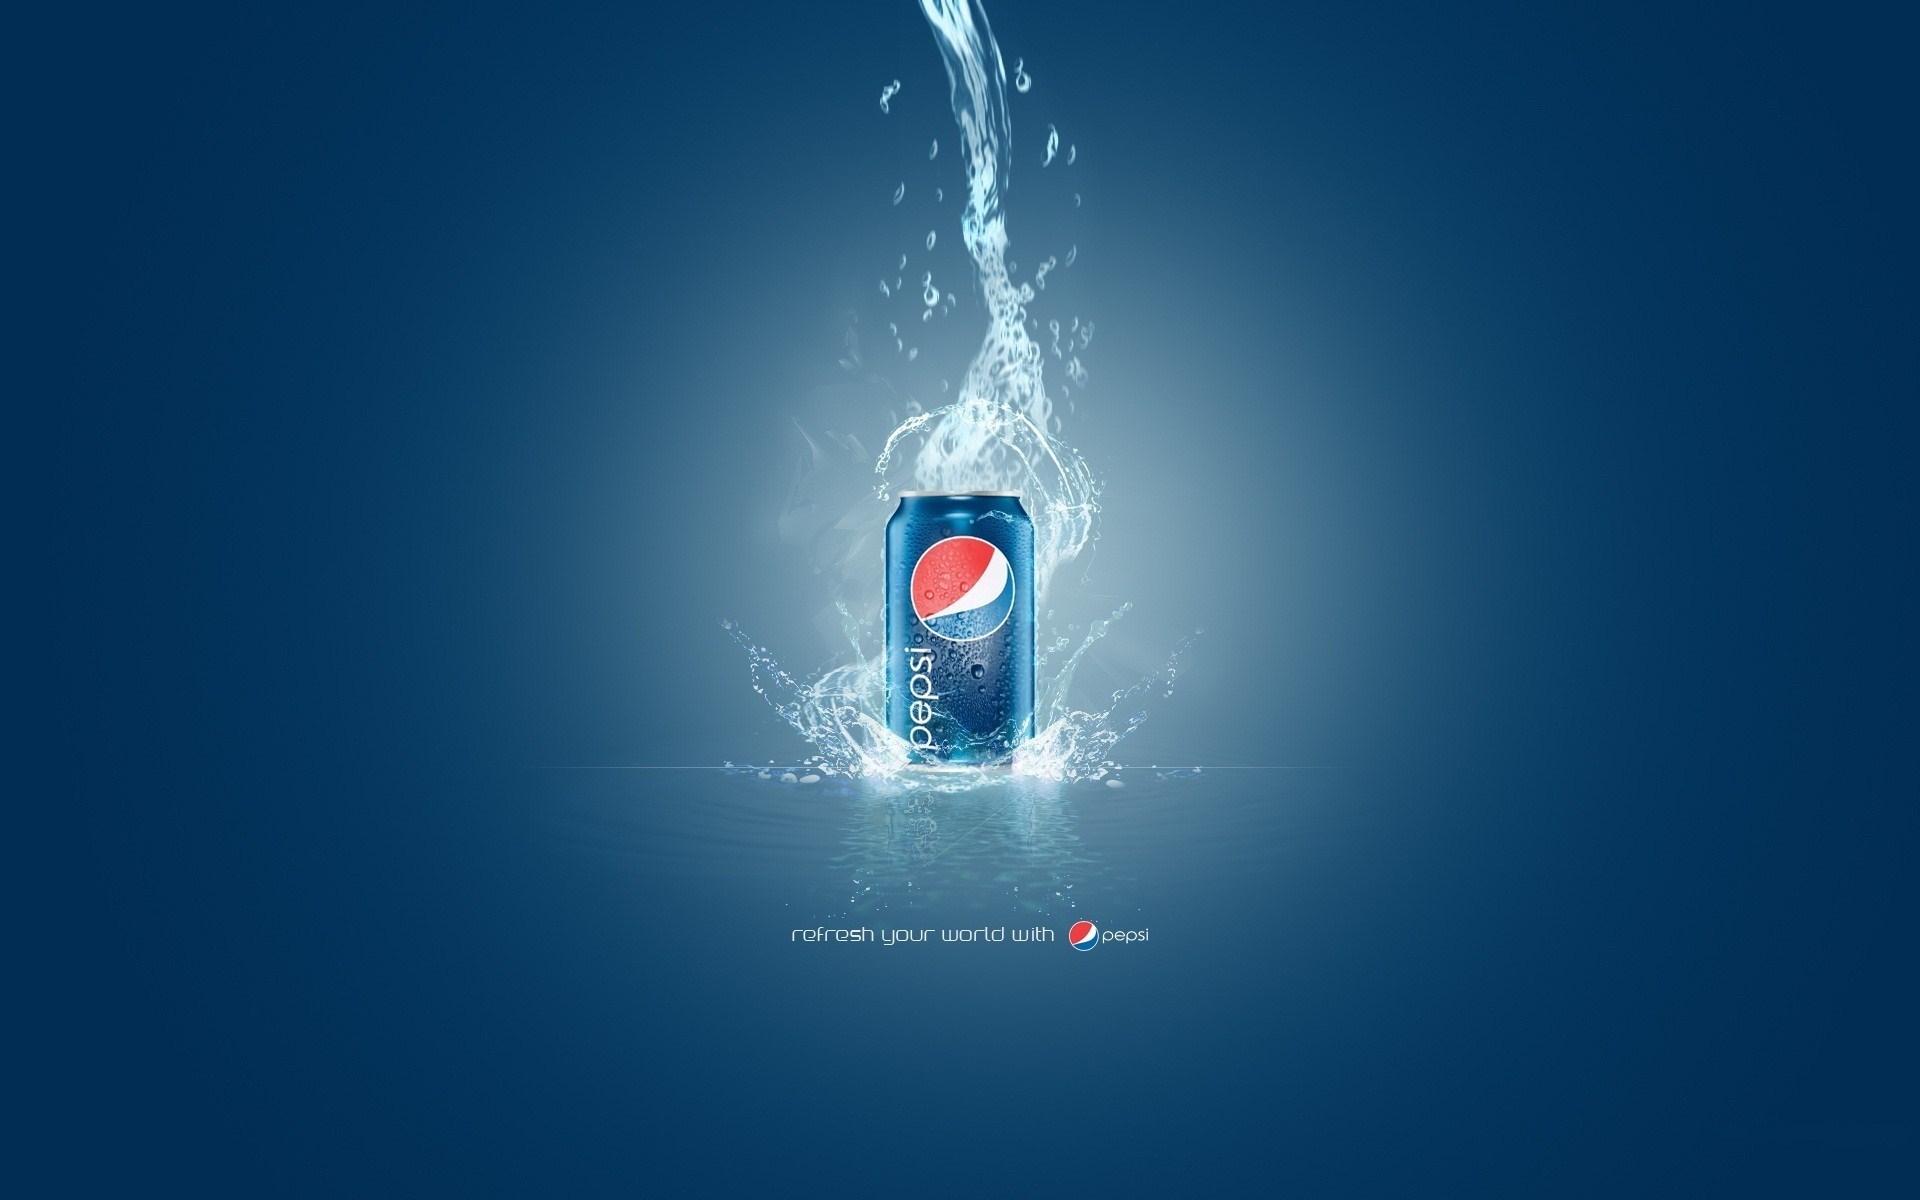 Pepsi Can Water Splash Logo Desktop Wallpaper Download 1920x1200